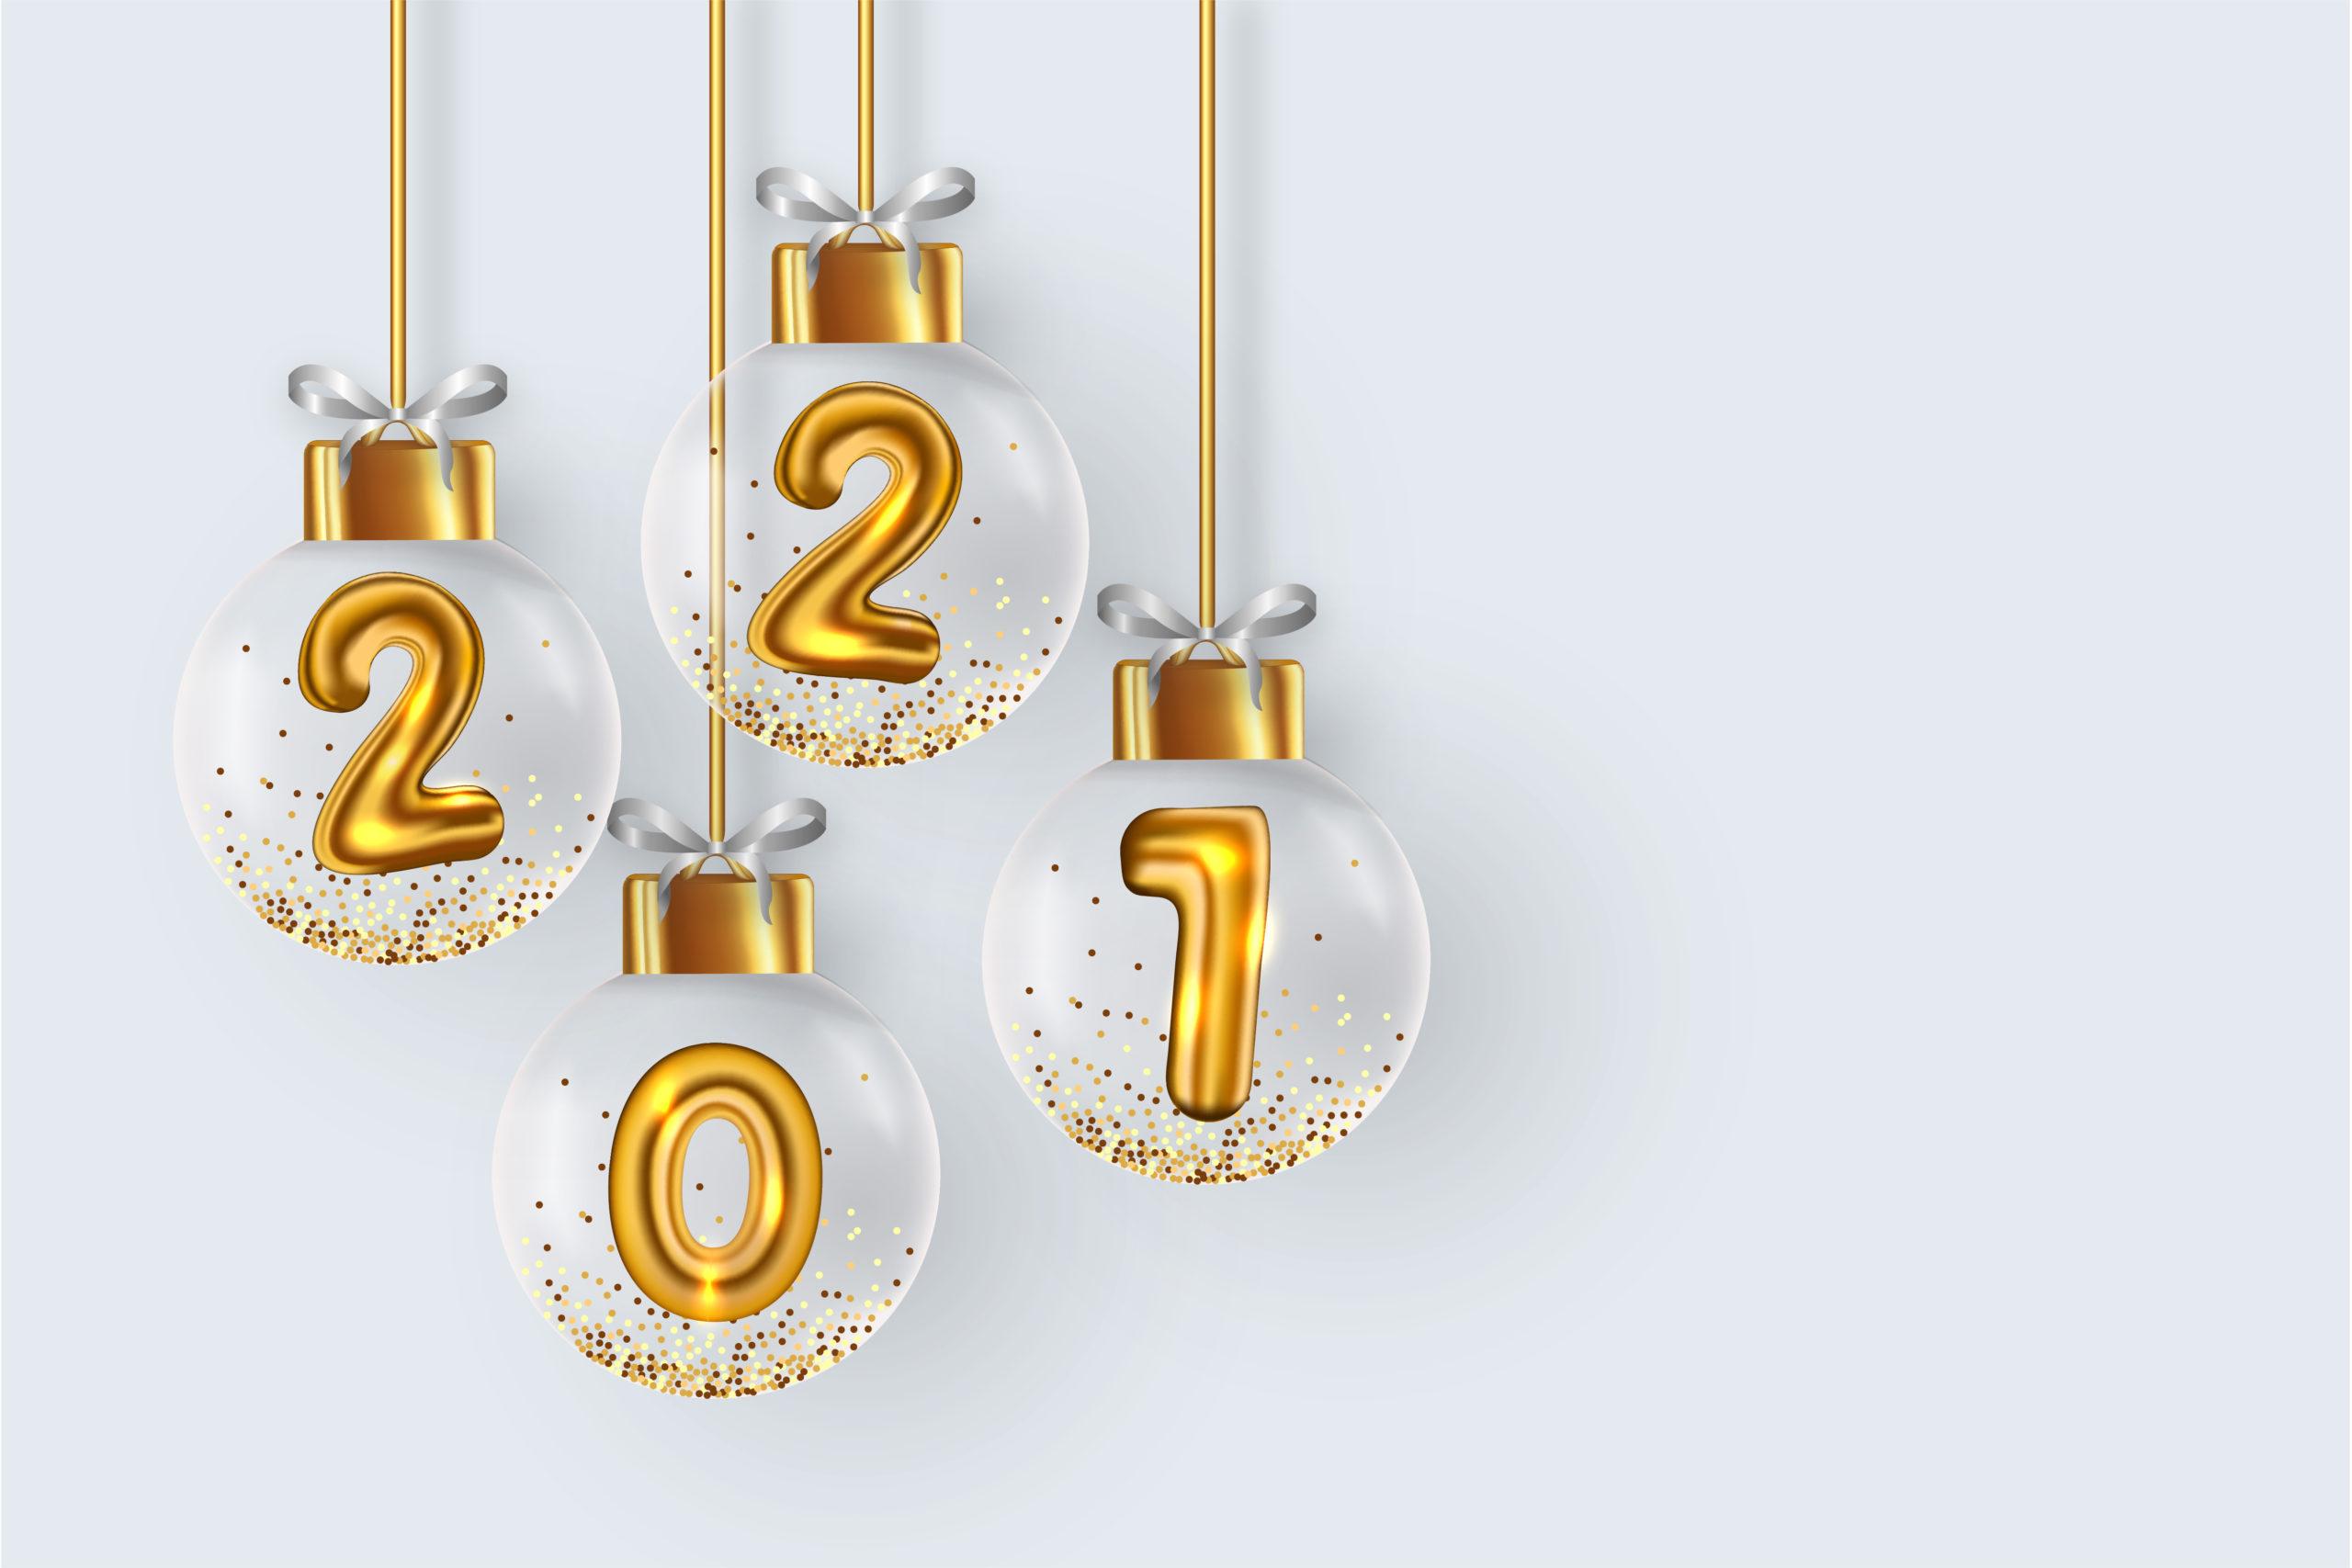 Bilan Watsoft 2020 : une année challengeante